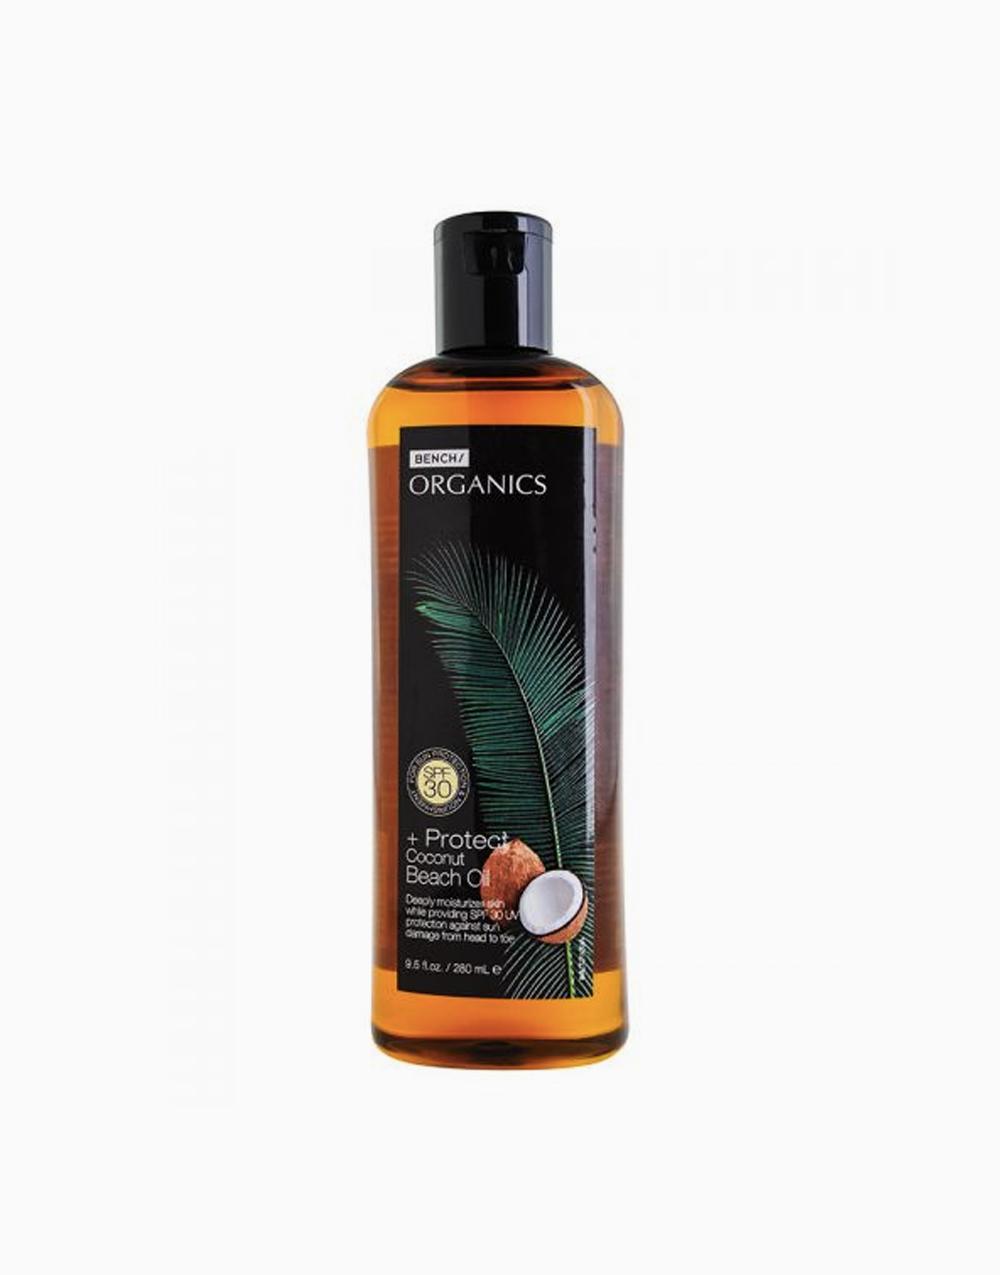 Organics: Coconut Beach Oil by BENCH